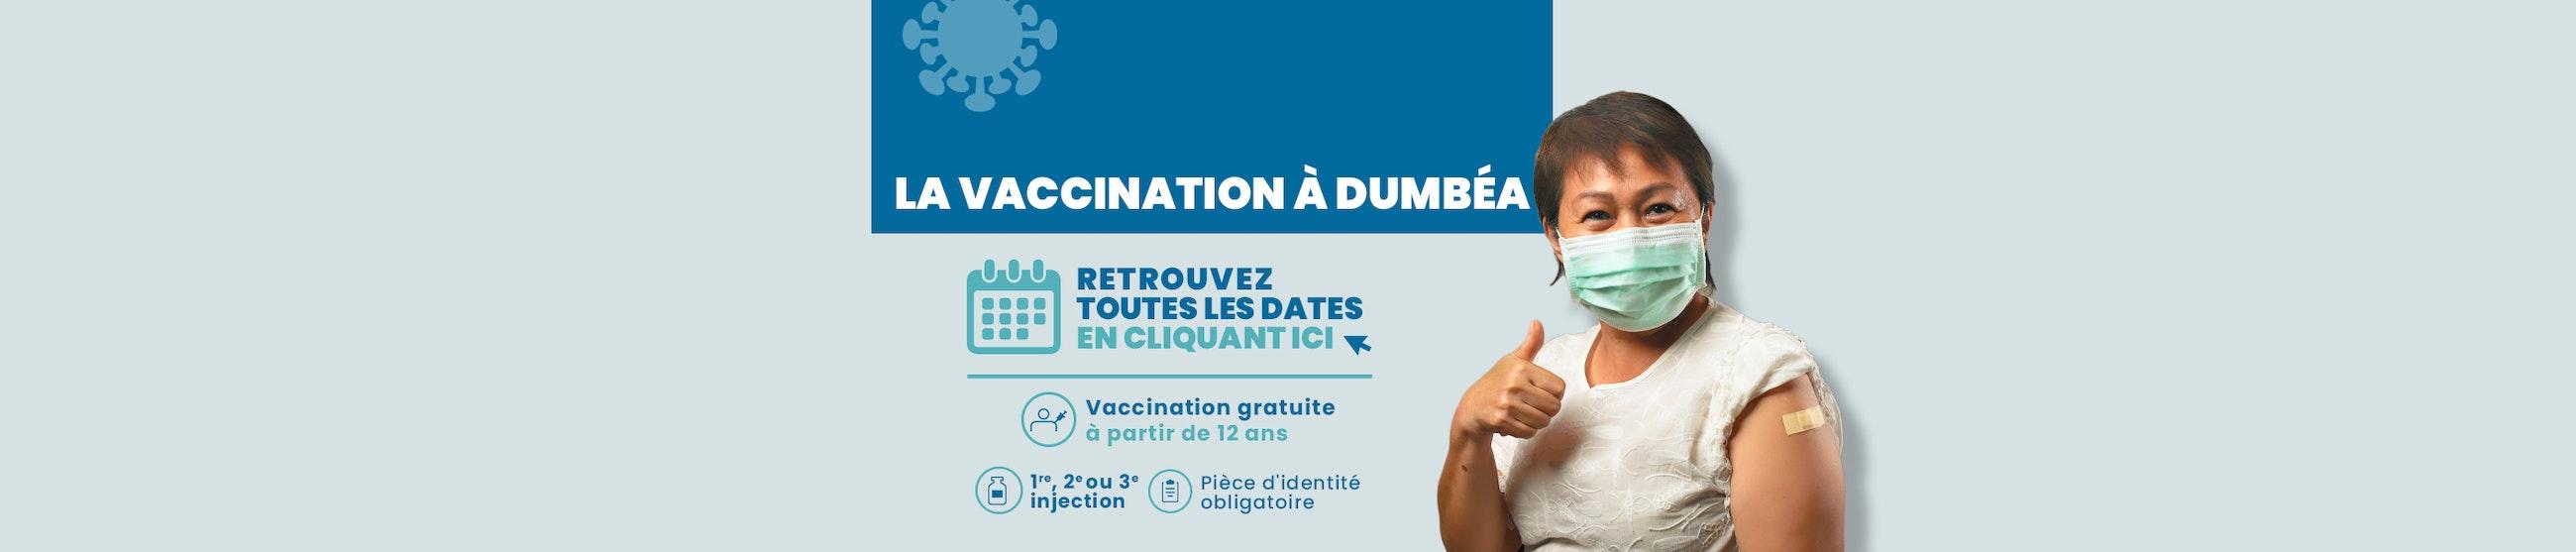 1632970494 slider site vaccination dumbea v2